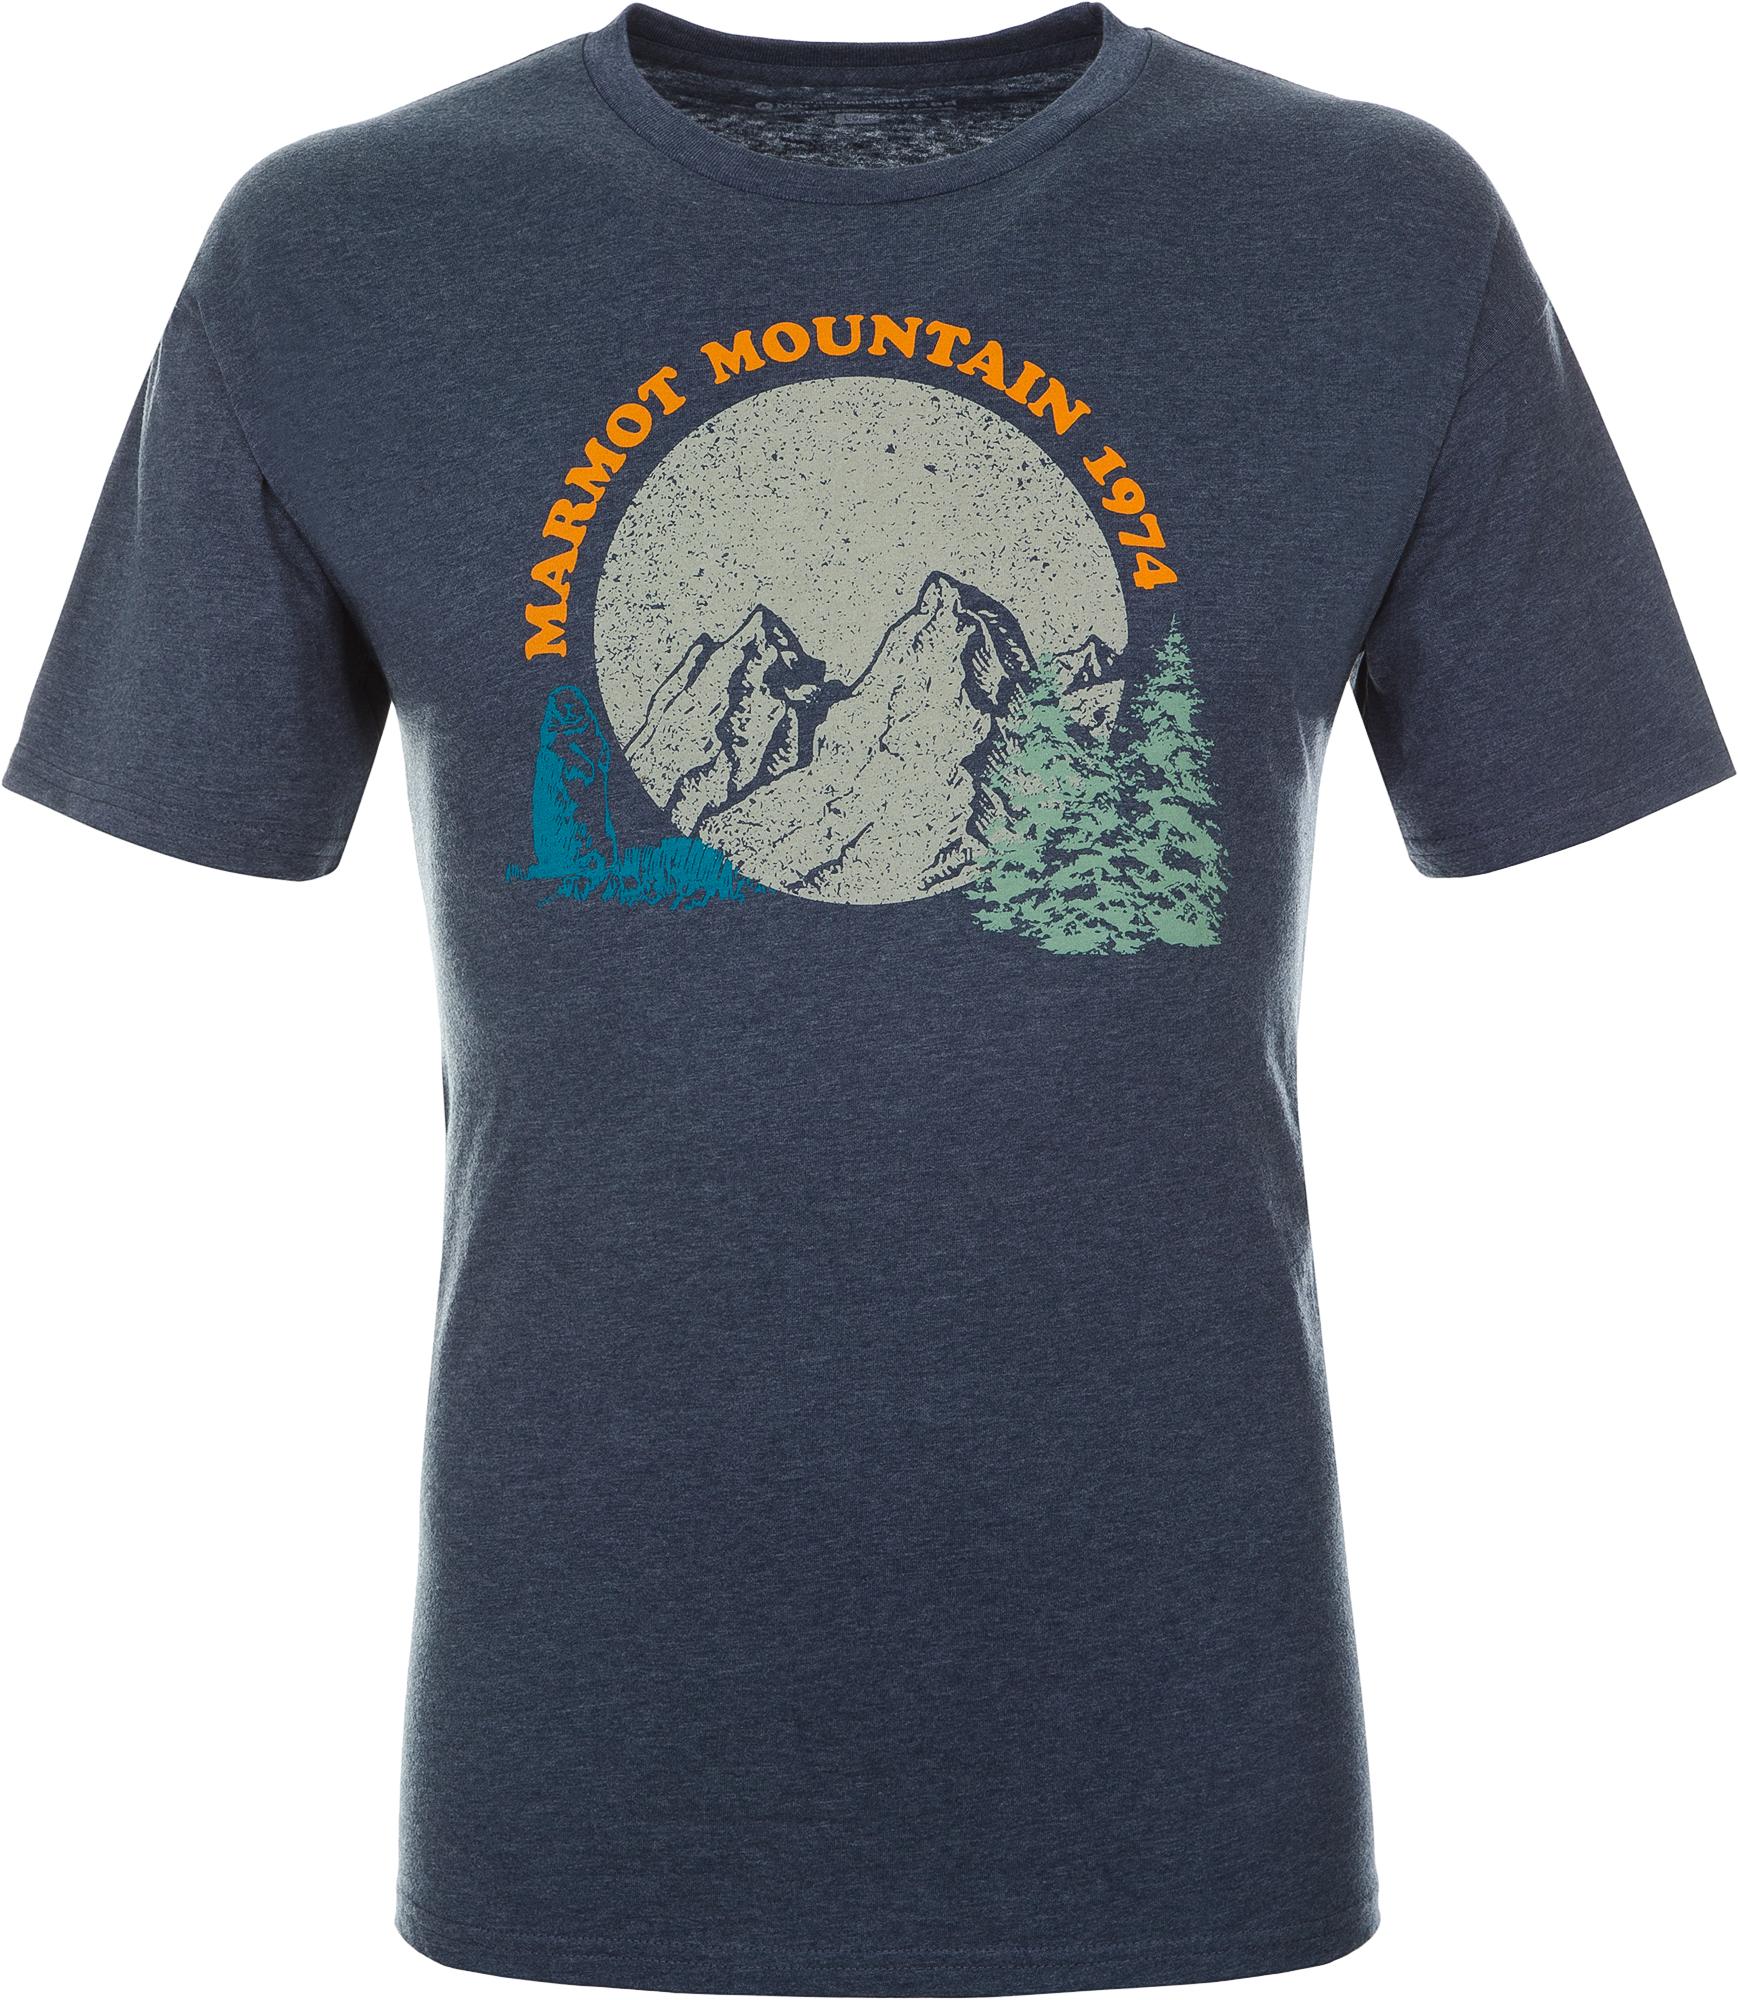 Marmot Футболка мужская Marmot, размер 58-60 цена